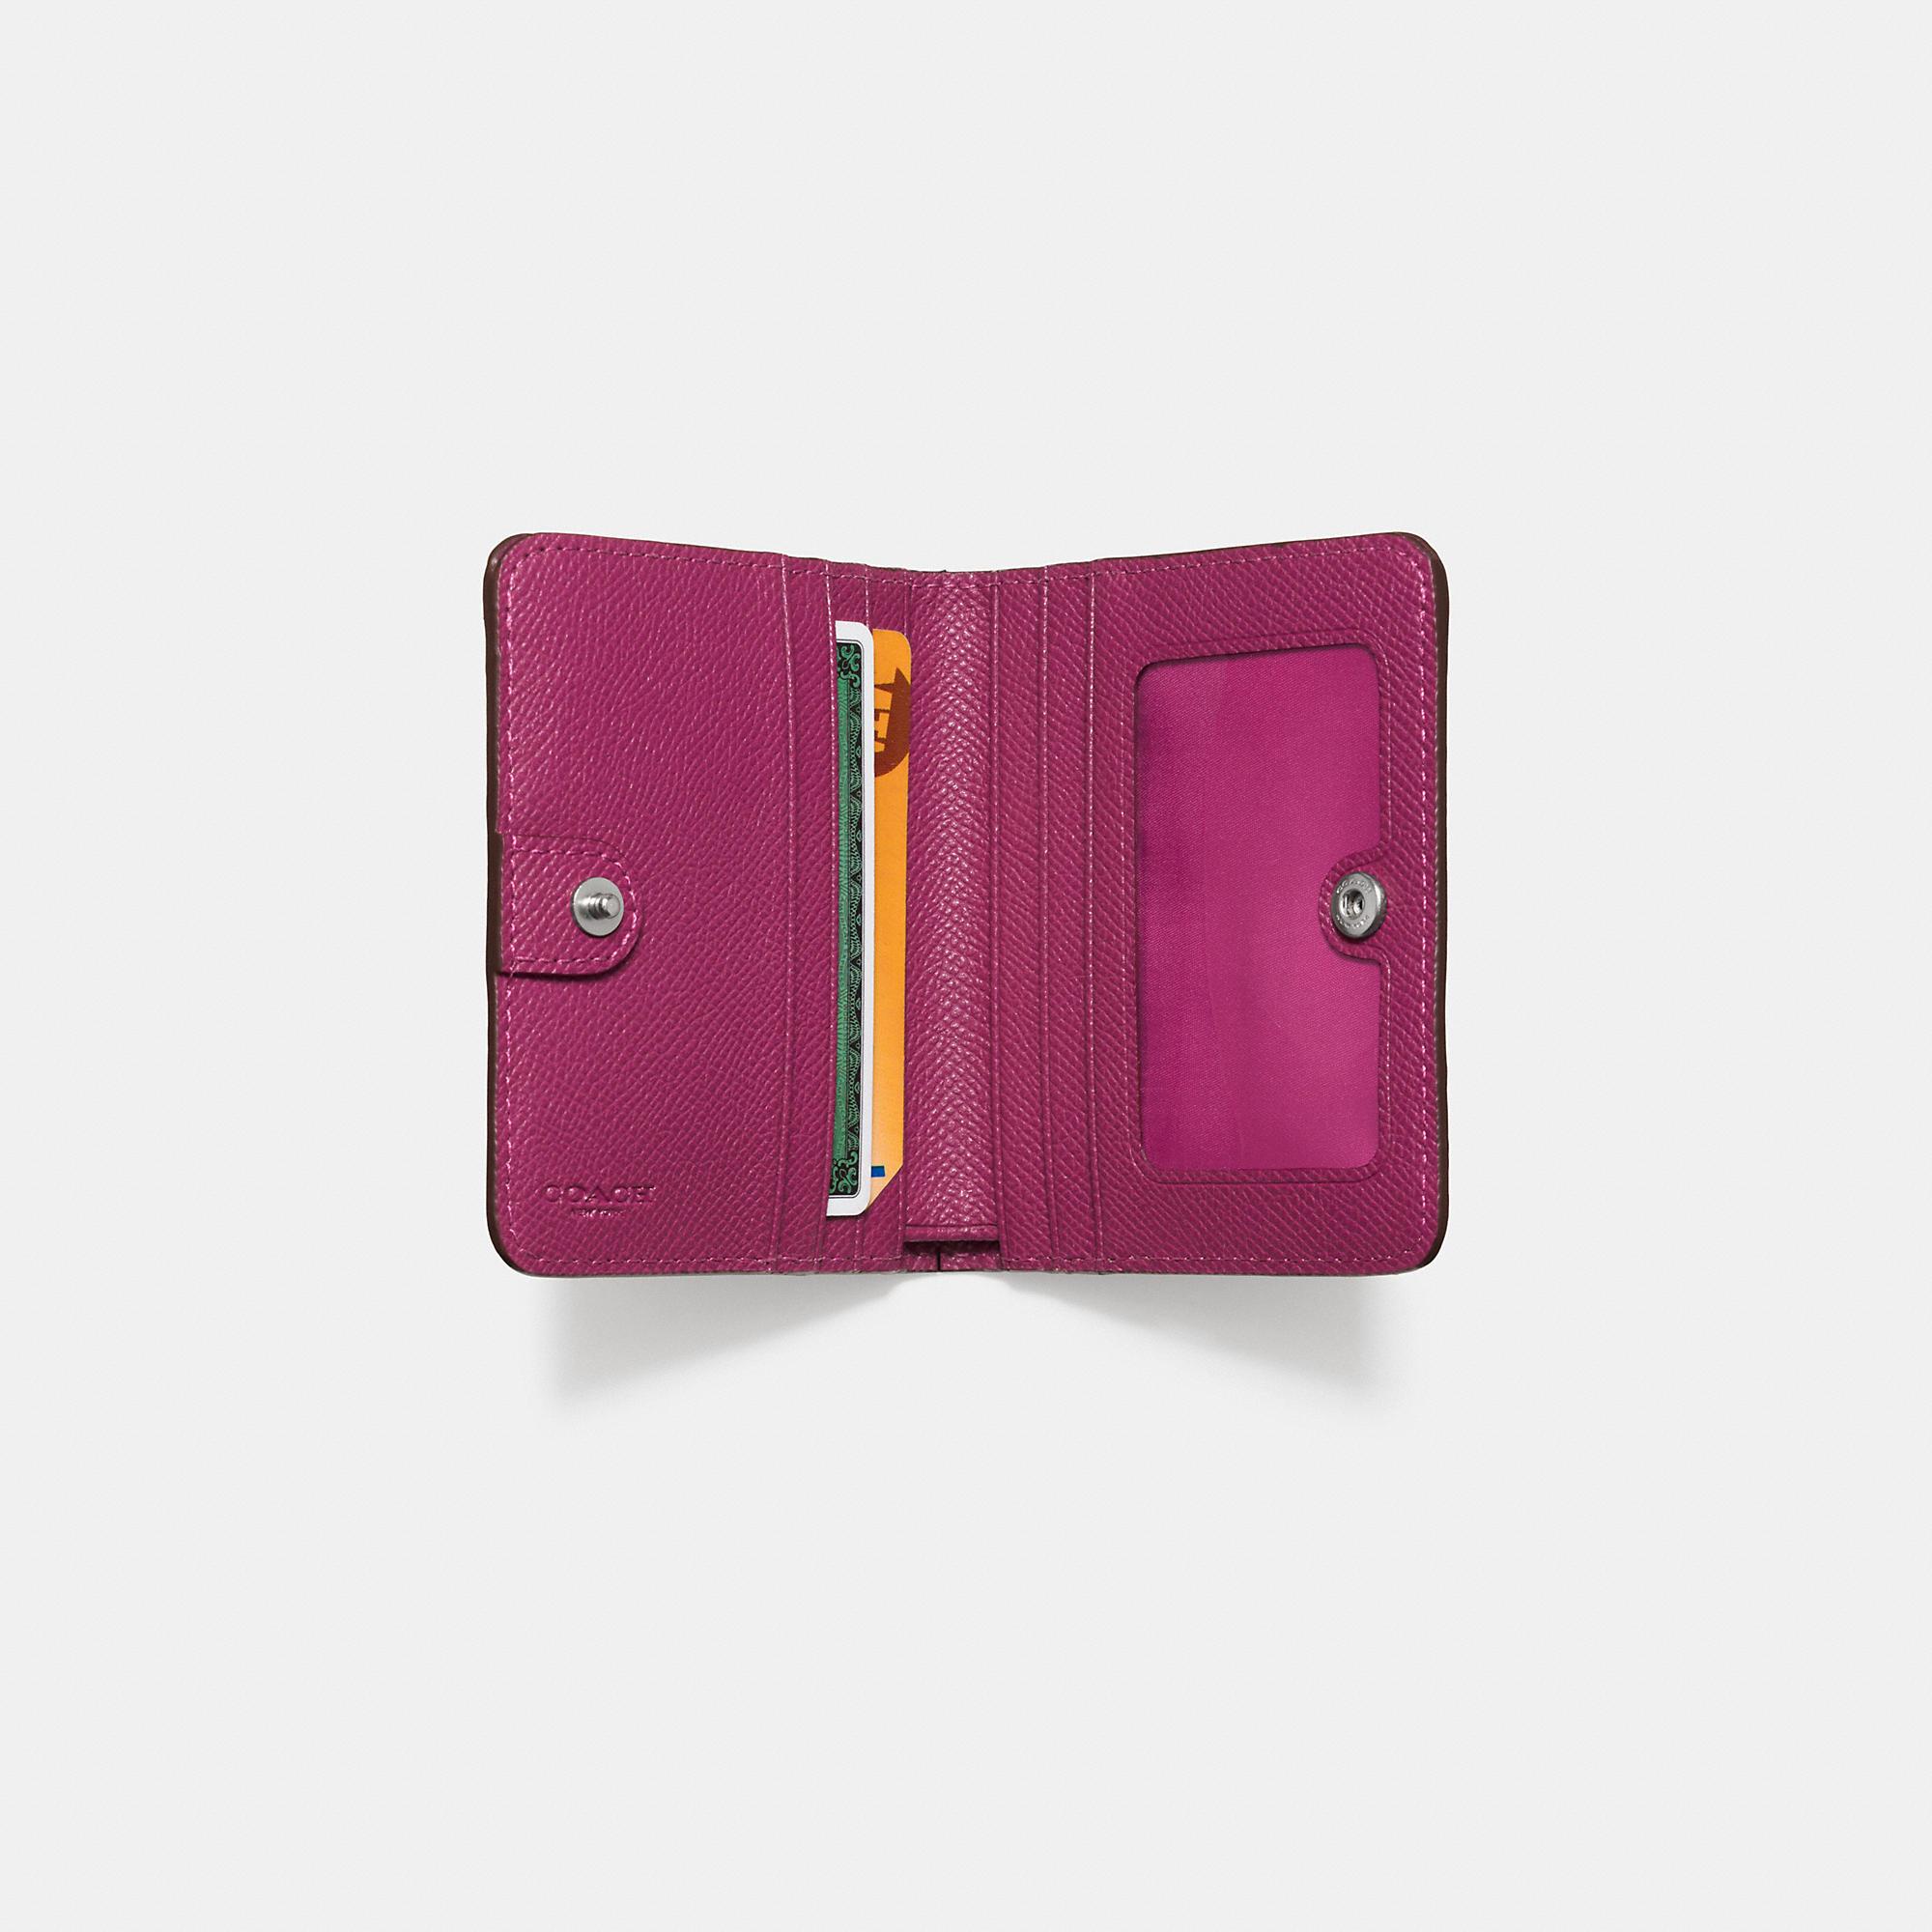 e5d3ed999fee Lyst - COACH Small Wallet In Edgestain Leather in Purple